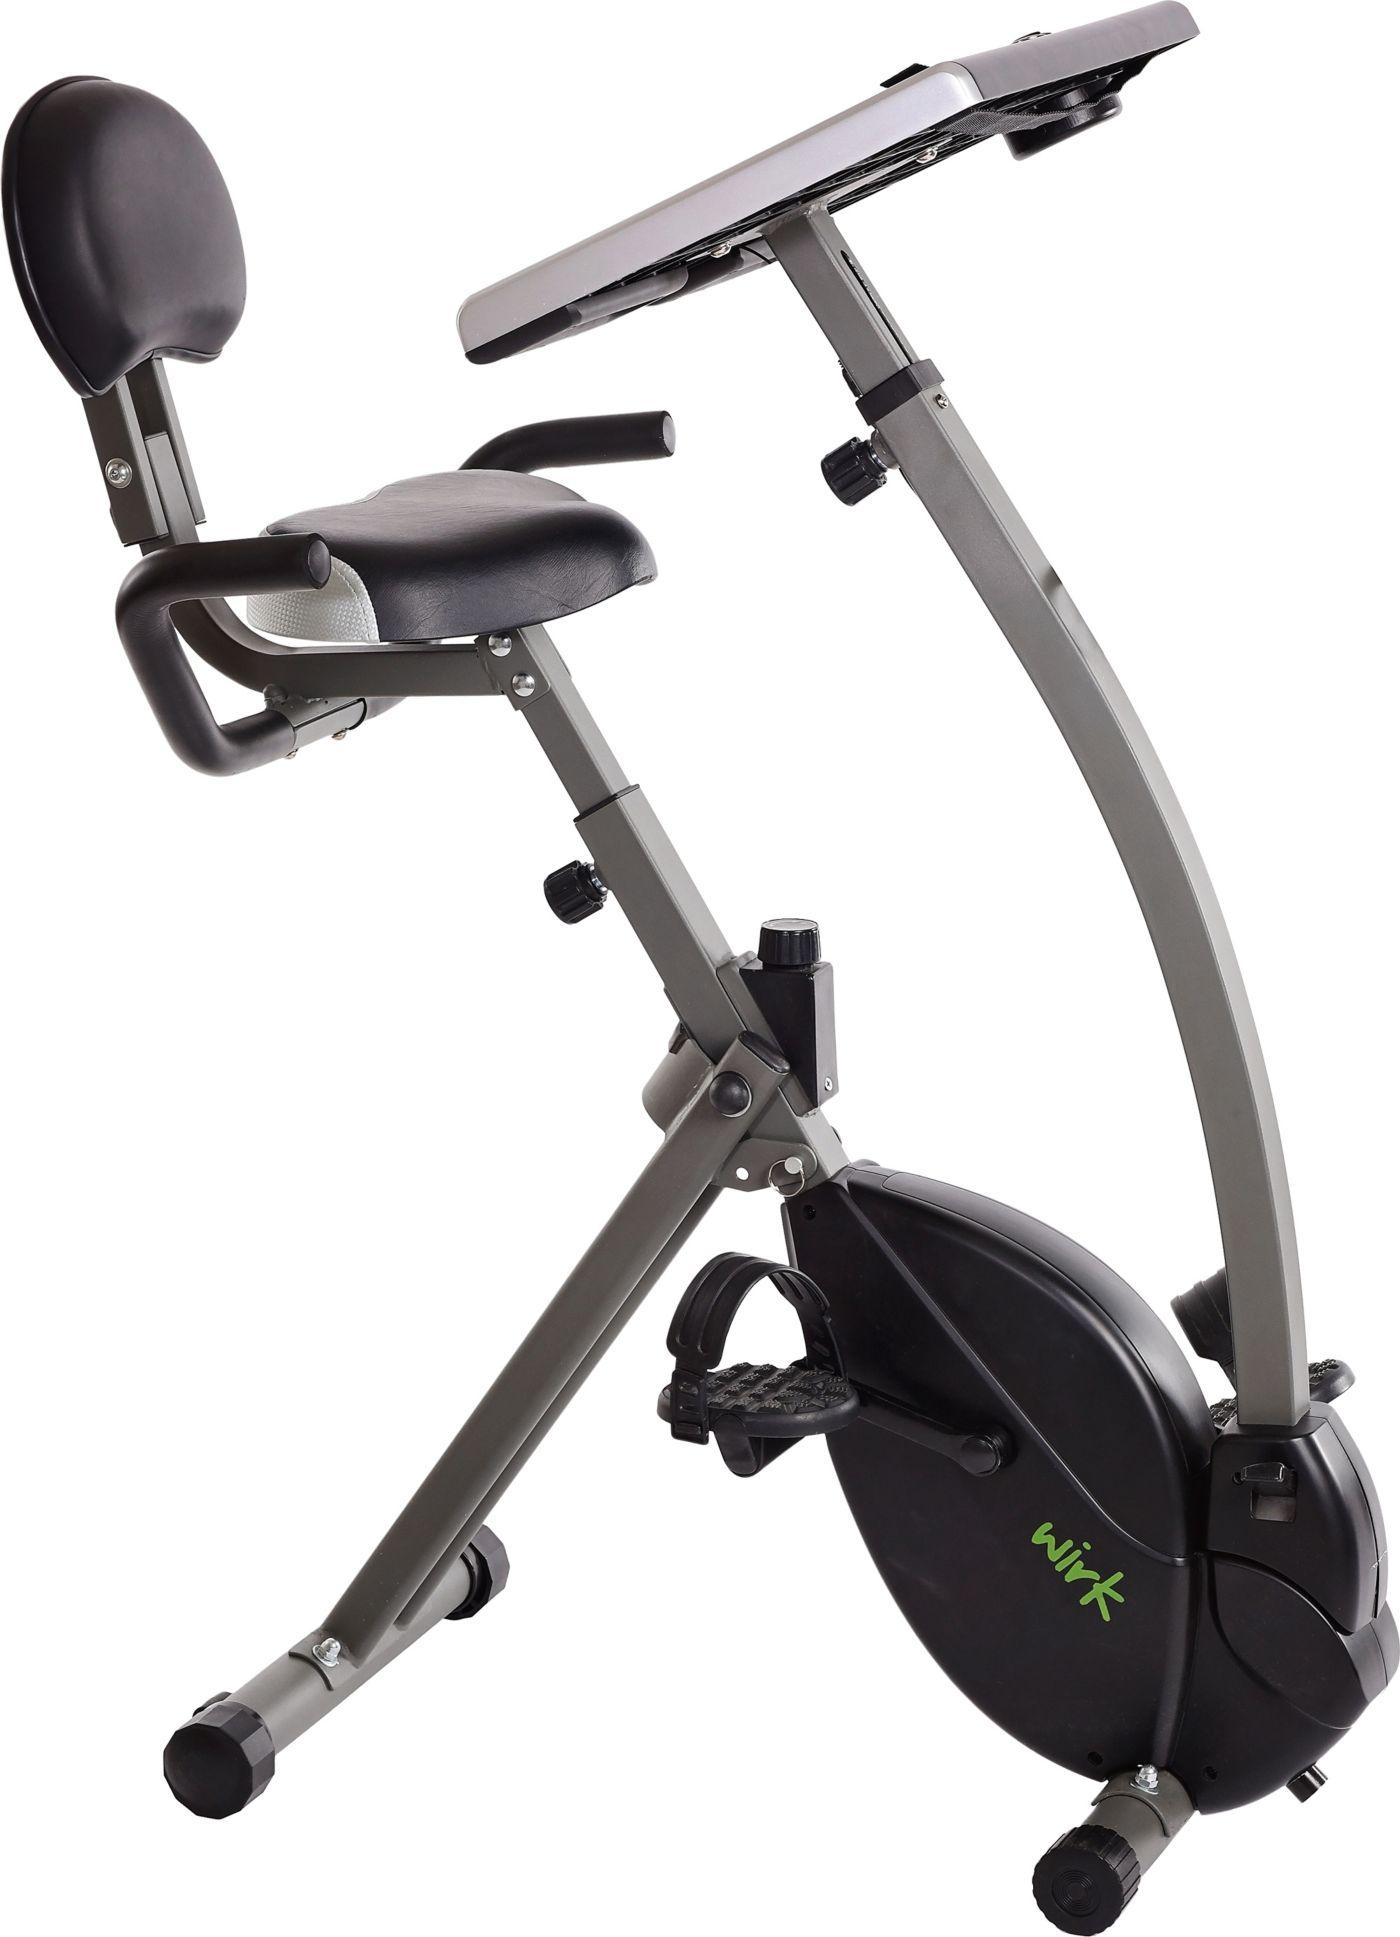 Stamina WIRK Ride Cycling Workstation